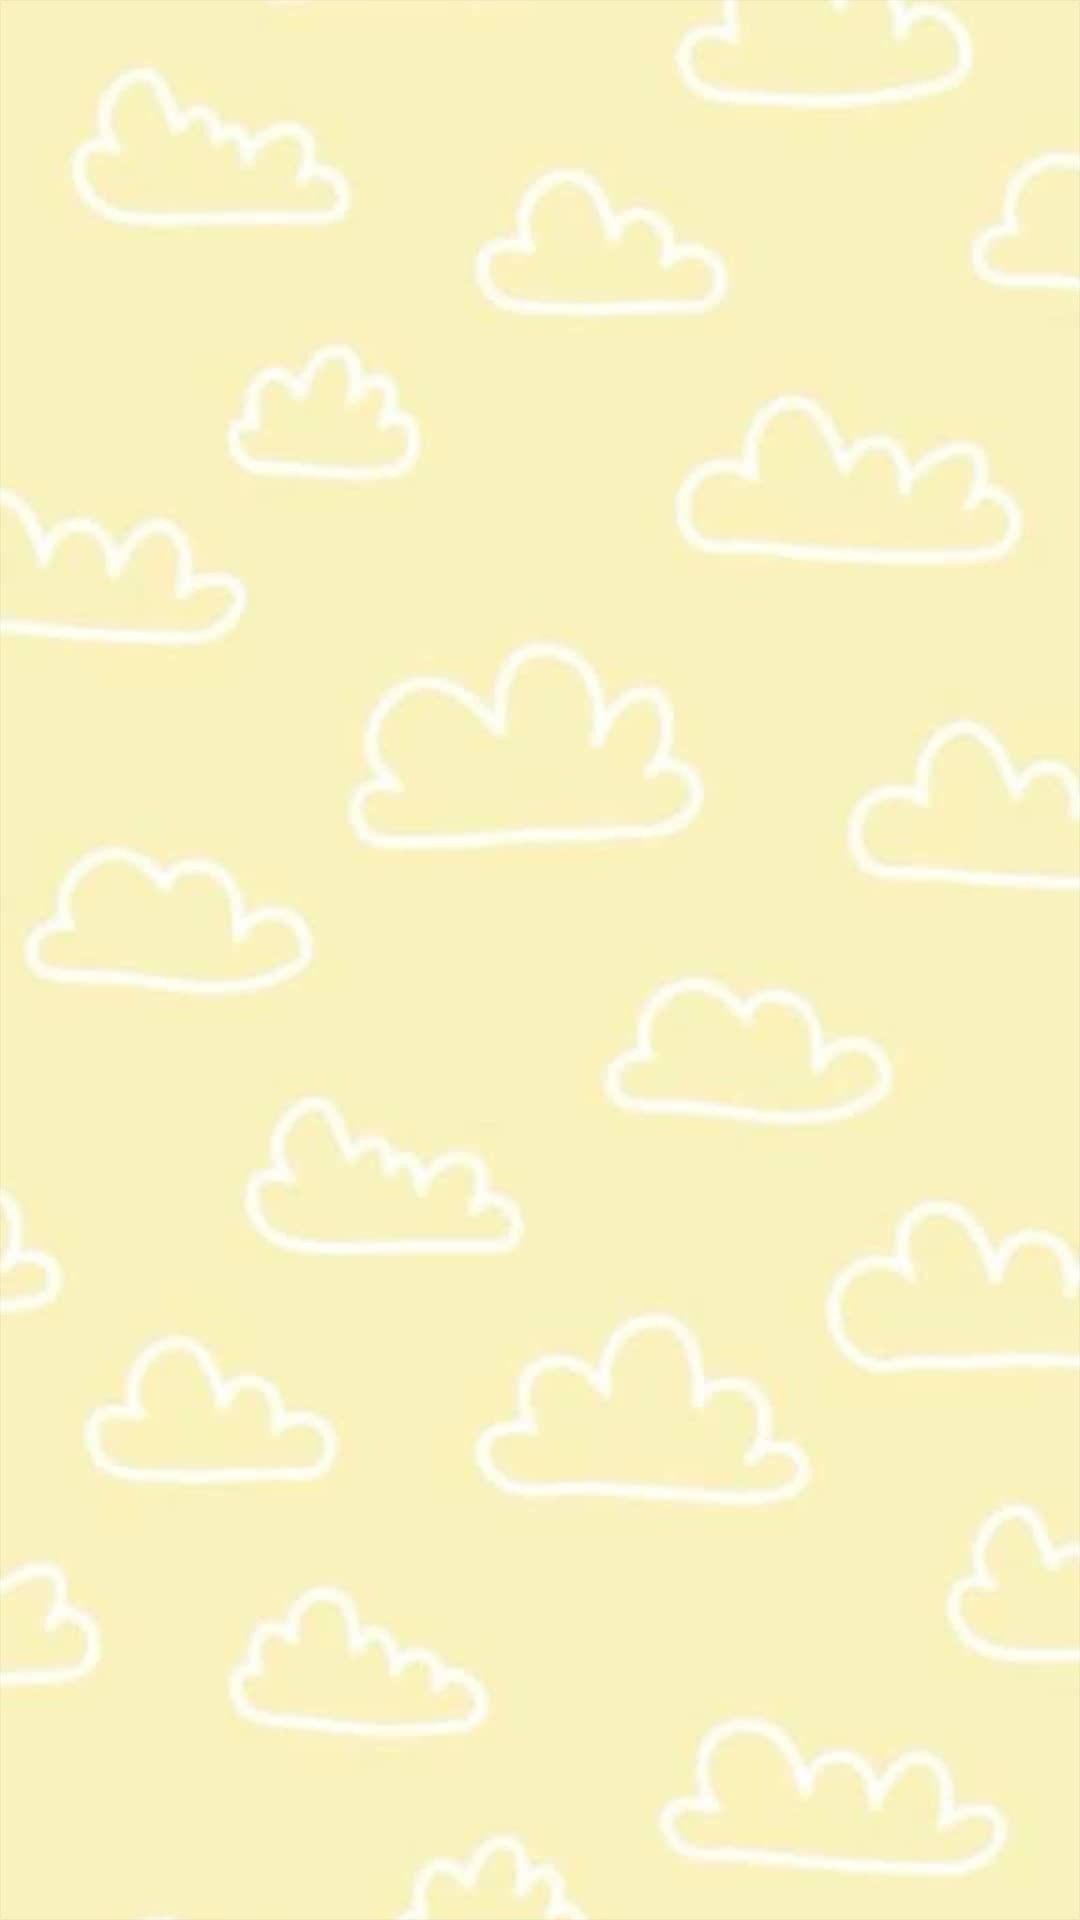 Vintage Pattern Wallpaper Download Cute Patterns Wallpaper Pattern Wallpaper Iphone Wallpaper Yellow